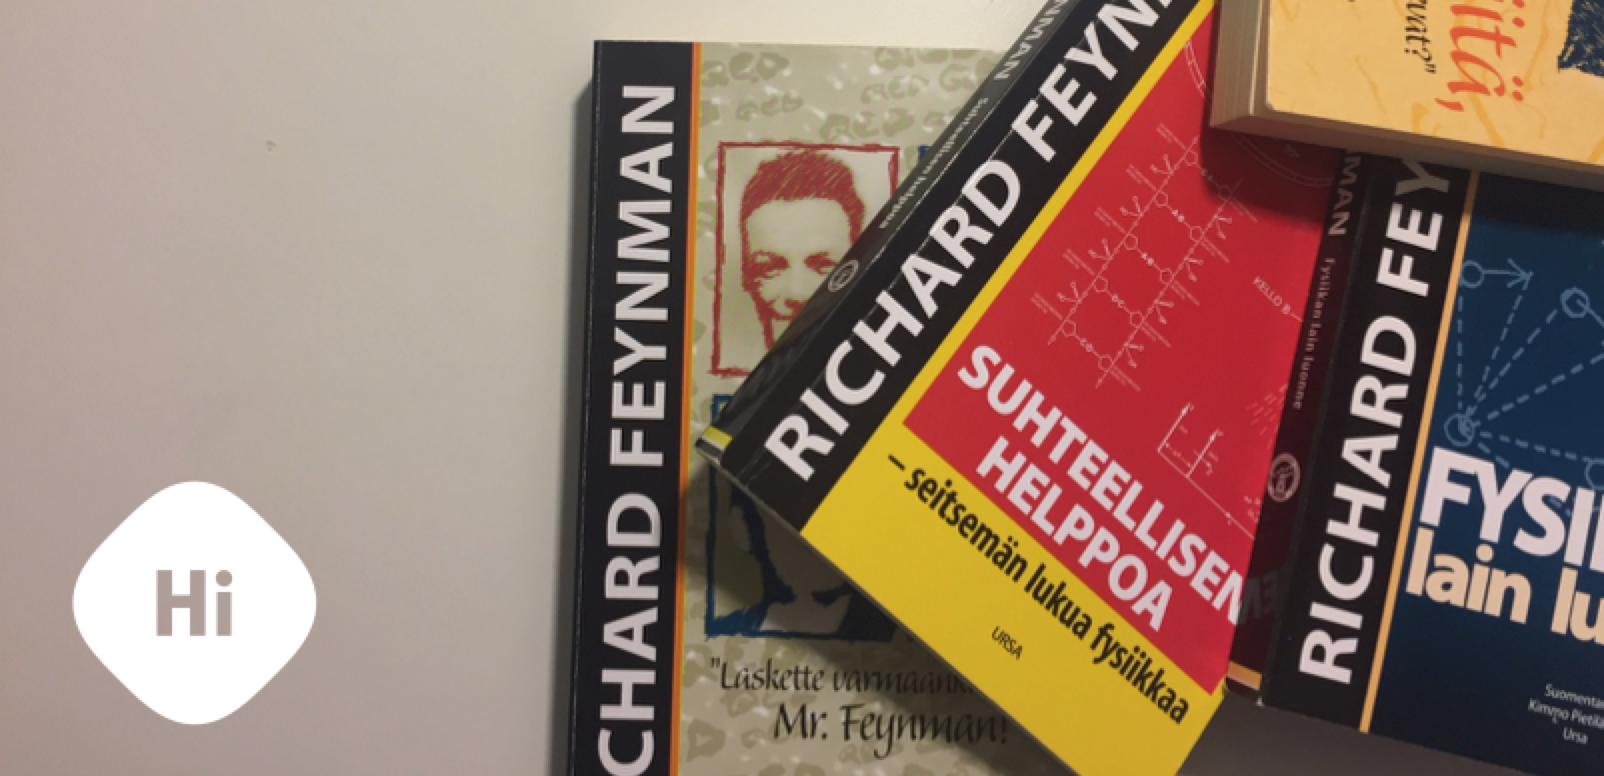 Richard Feynman tietokone